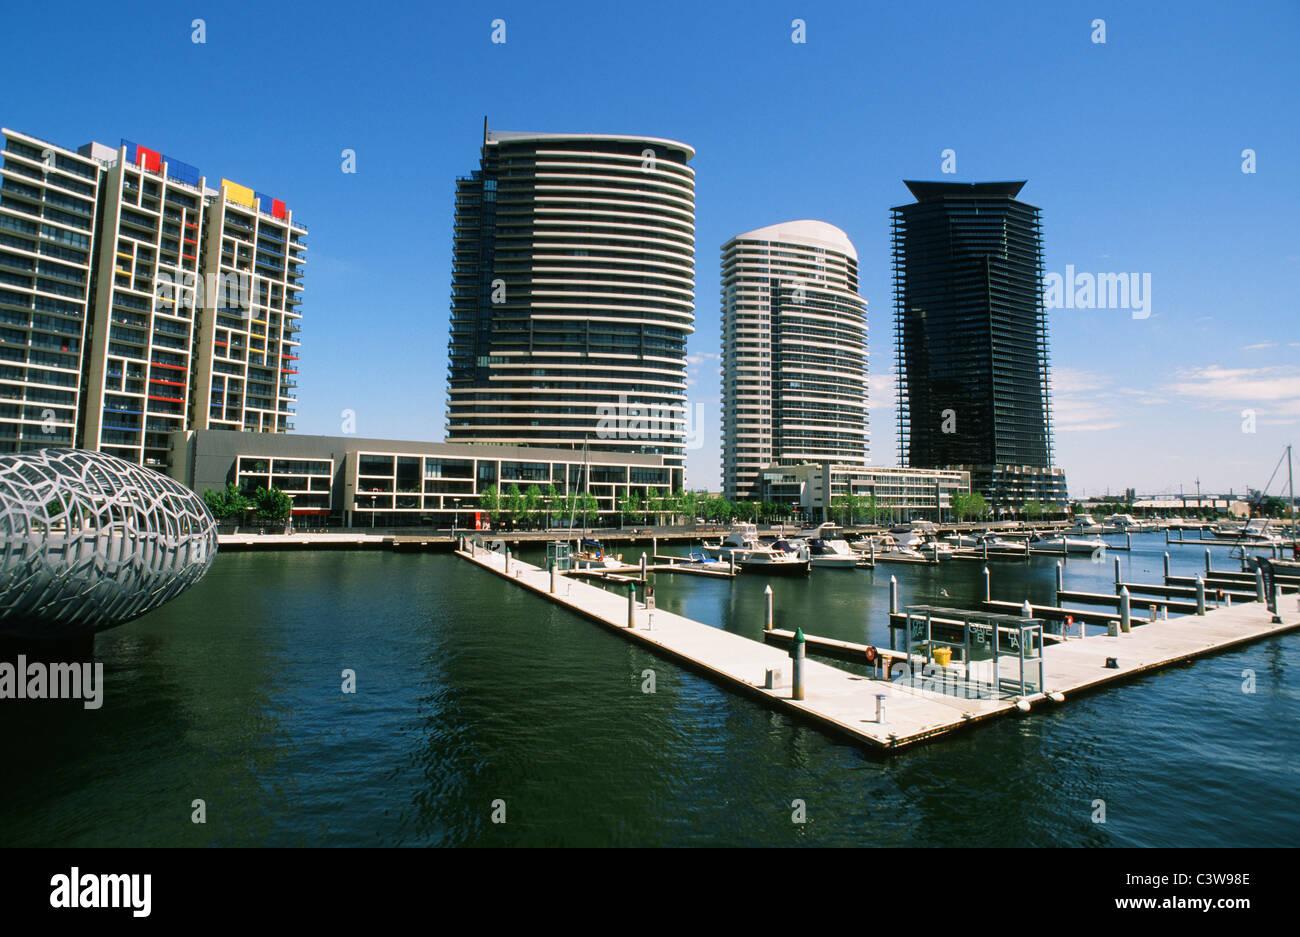 Yarra's Edge withWebb Bridge (l.) in the docklands of Melbourne, Victoria, Australia - Stock Image